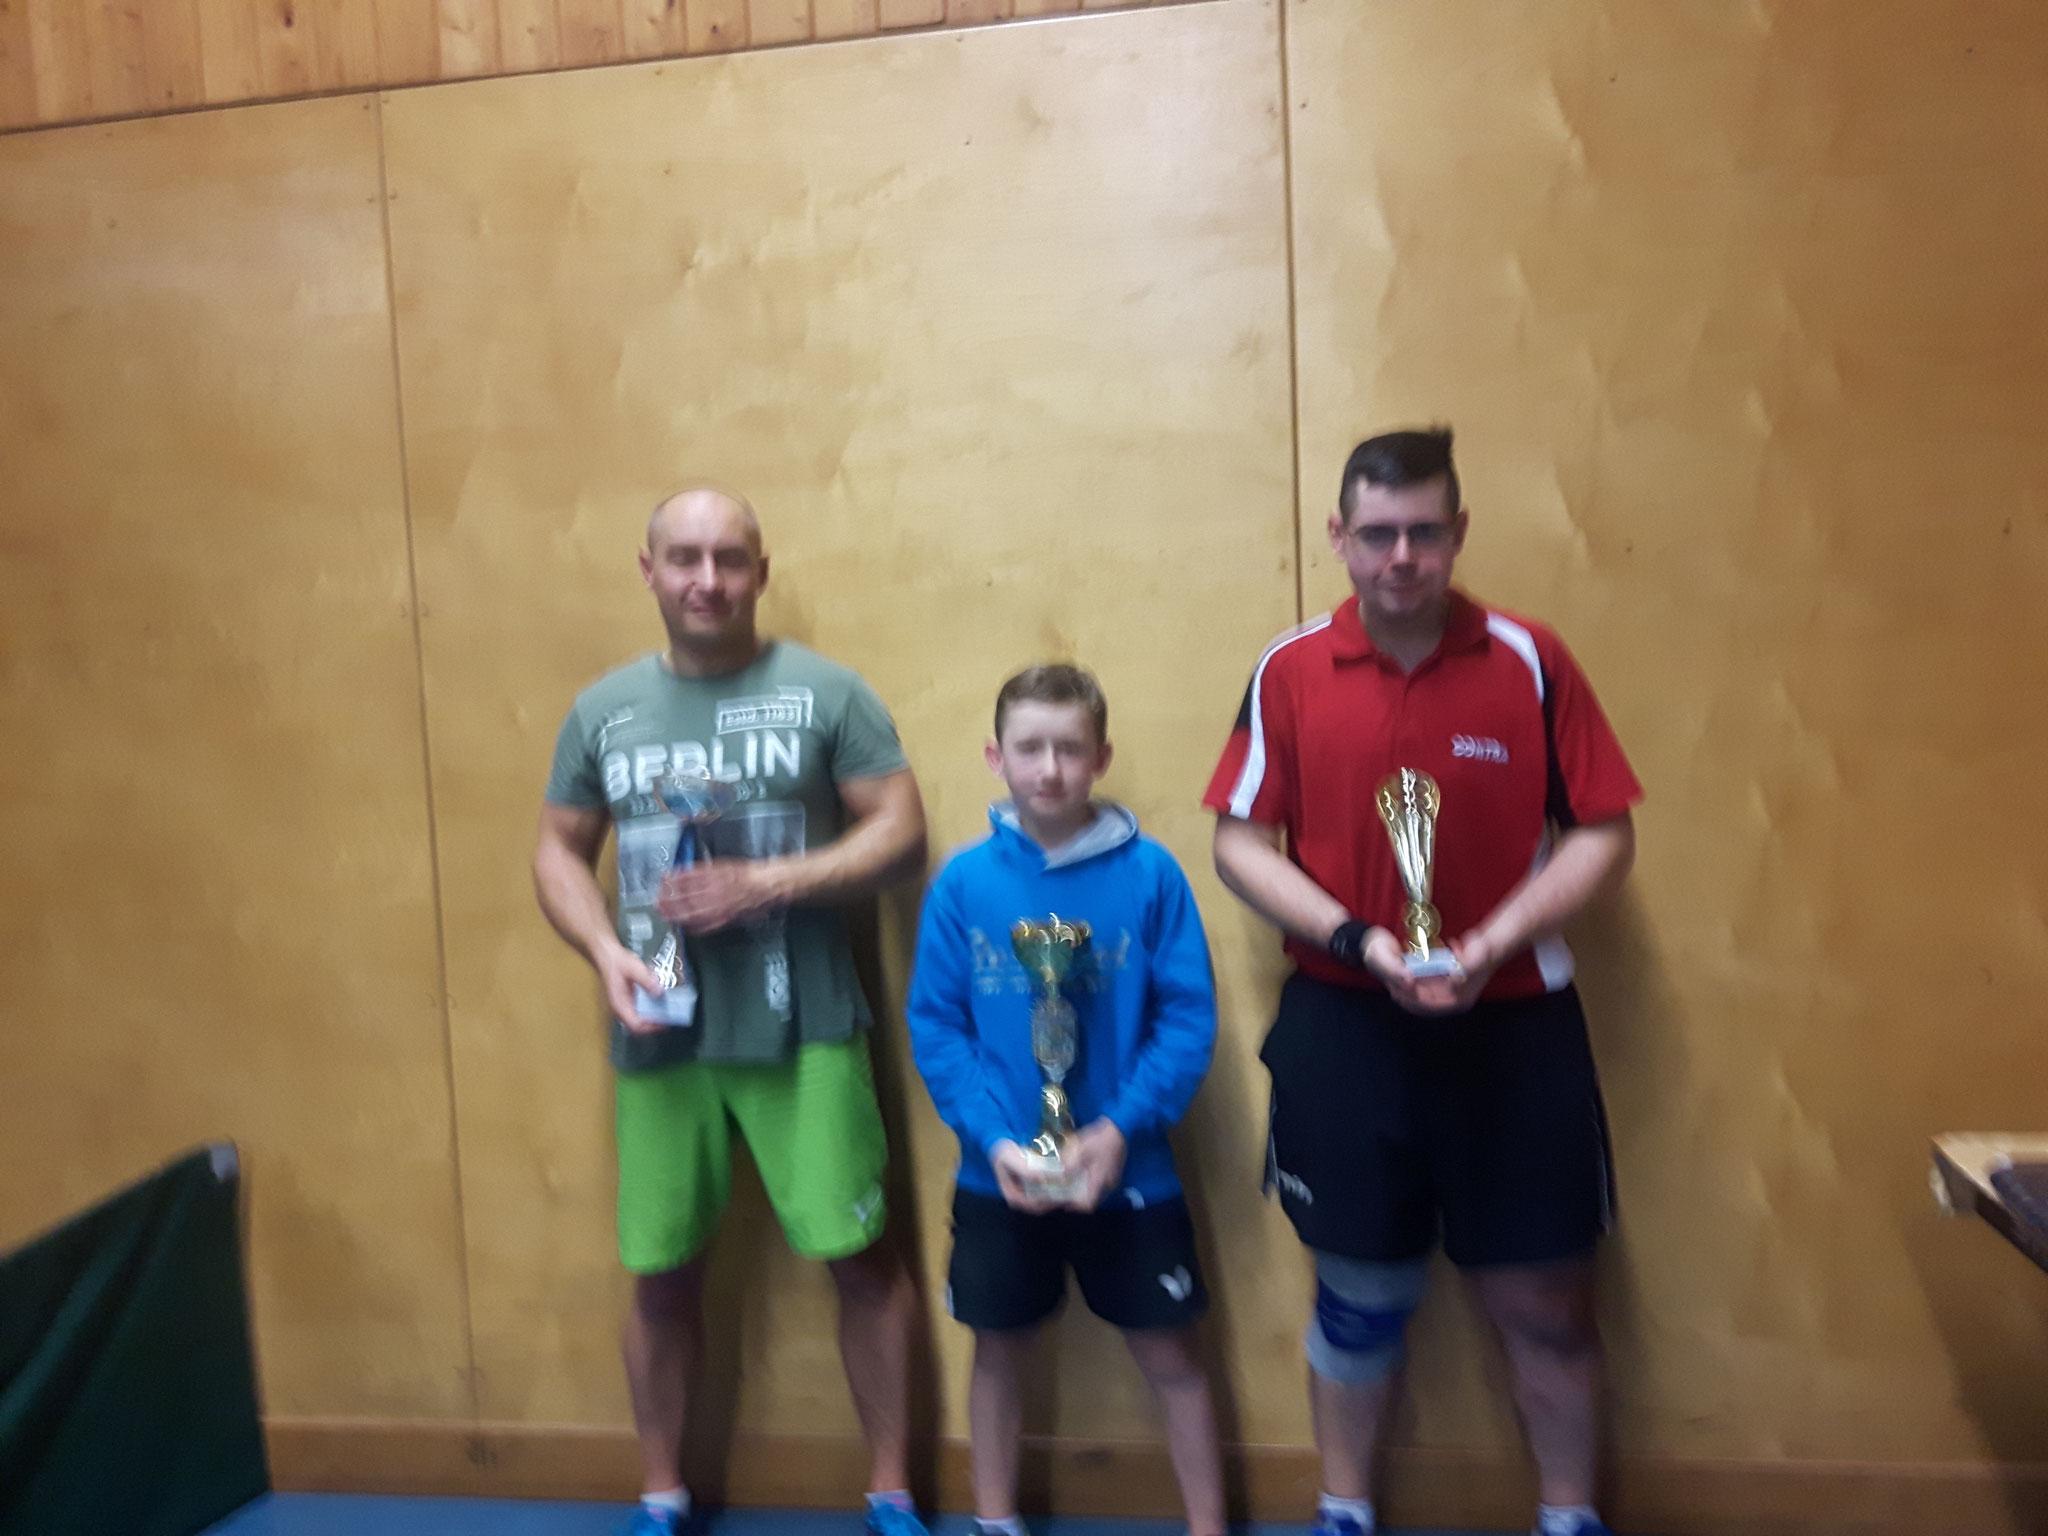 Siegerfoto Bewerb B: v.l.n.r. Marcin Gibala (WPAE) (Platz 2), Julian Rzihauschek (SVS) (Sieger), Mathias Haidvogl (SPAR) (Platz 3)